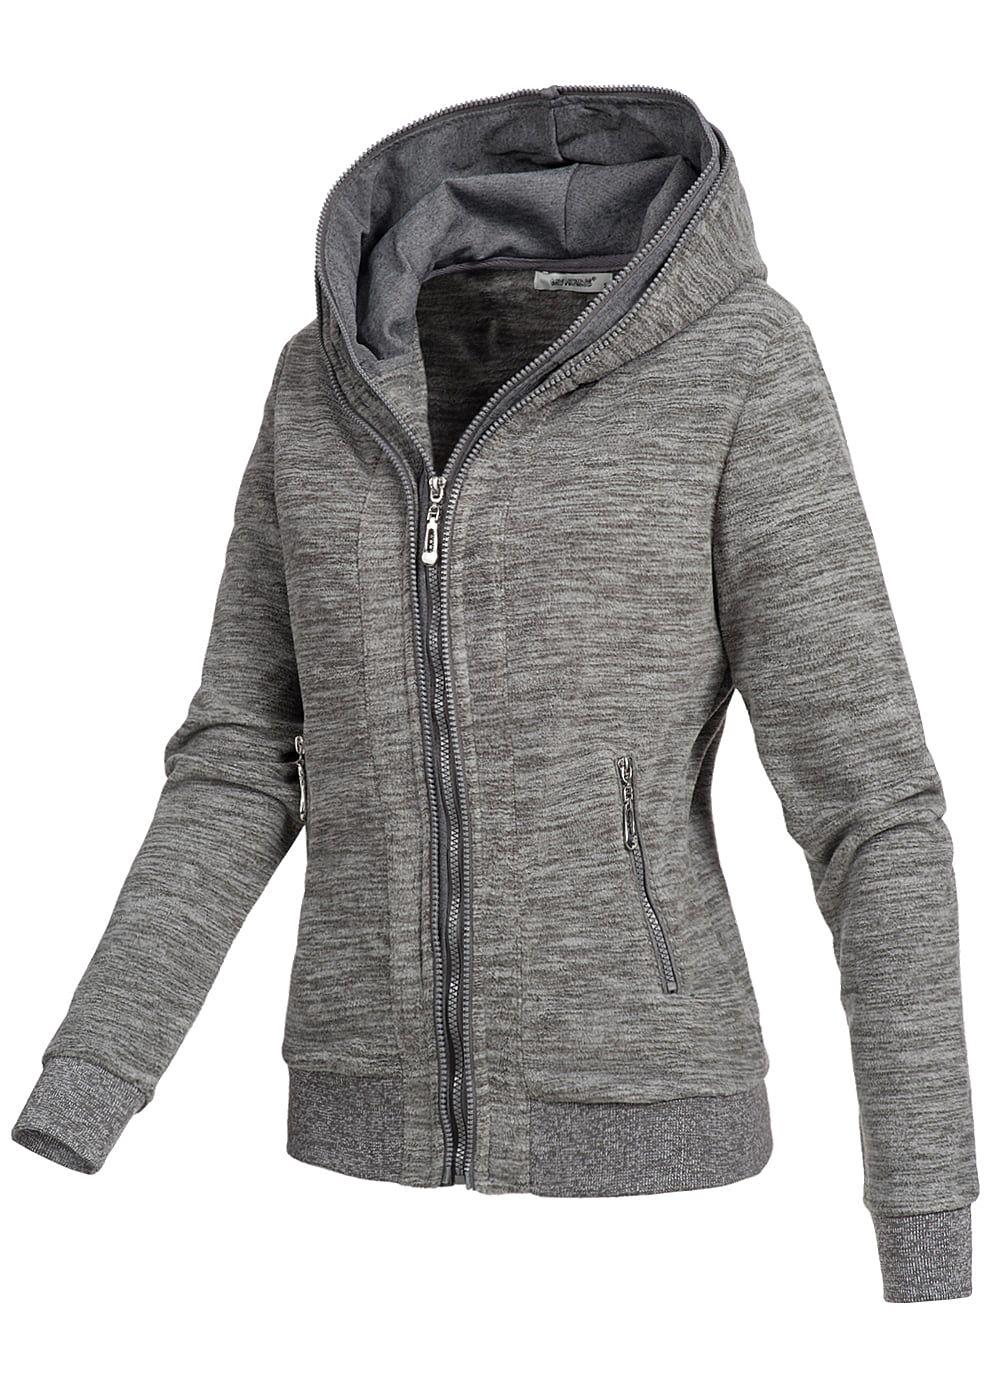 seventyseven lifestyle damen fleece zip hoodie kapuze 2 taschen grau melange 77onlineshop. Black Bedroom Furniture Sets. Home Design Ideas